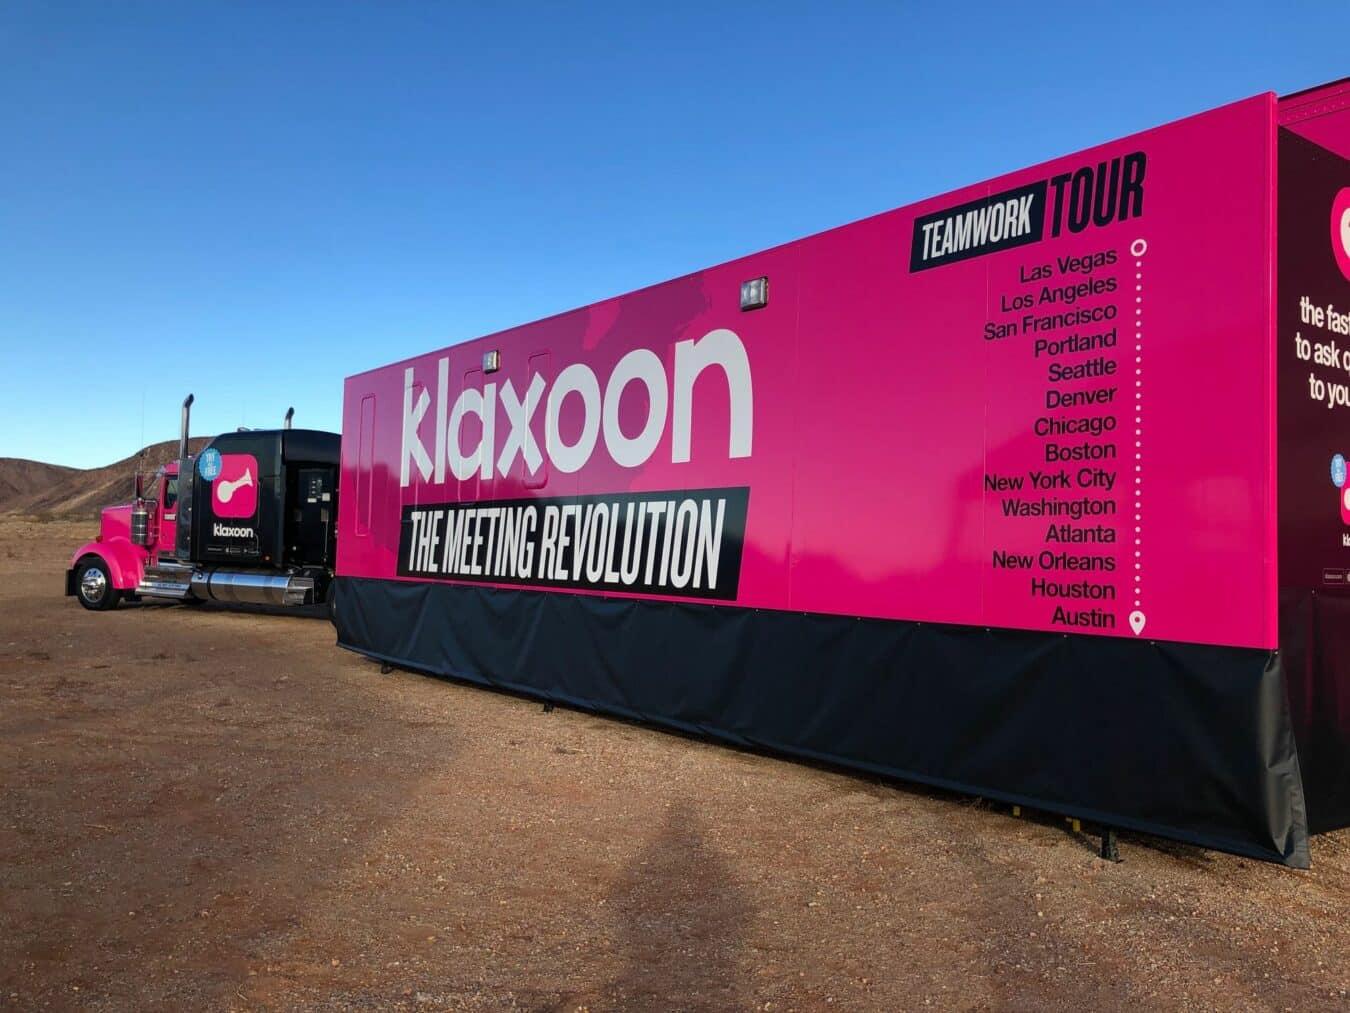 Klaxoon 3 - CES 2019 - Teamwork Tour truck